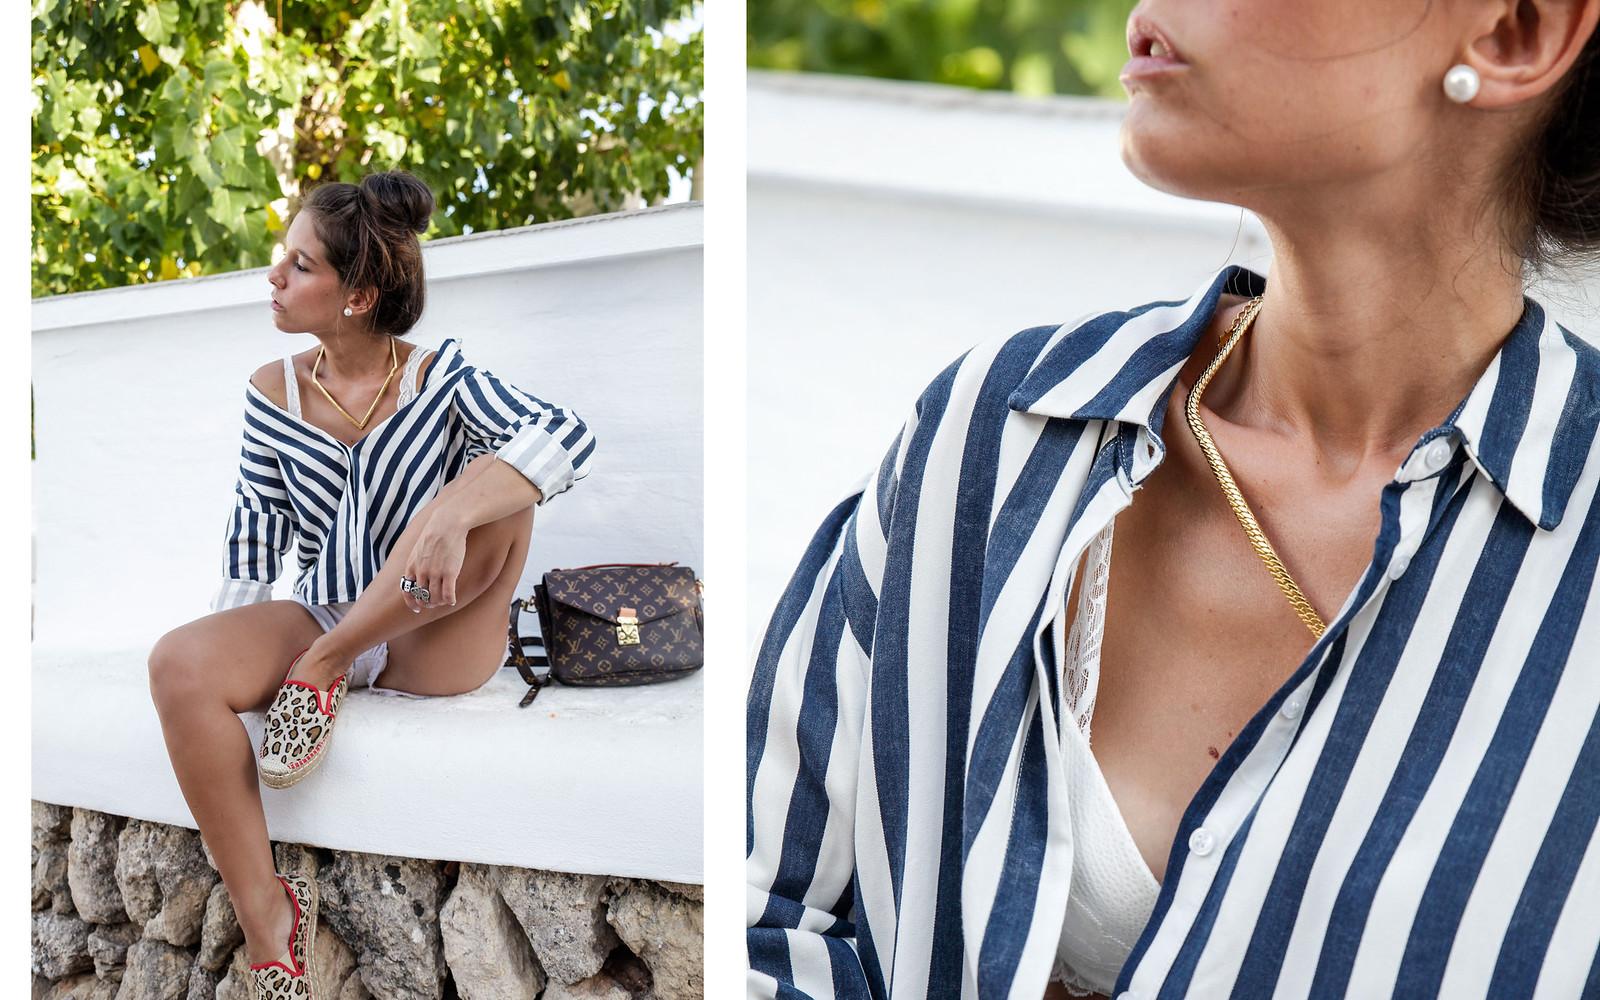 03_Leopard_and_stripes_perfec_mix_print_outfit_THEGUESTGIRL_camisa_rayas_marinera